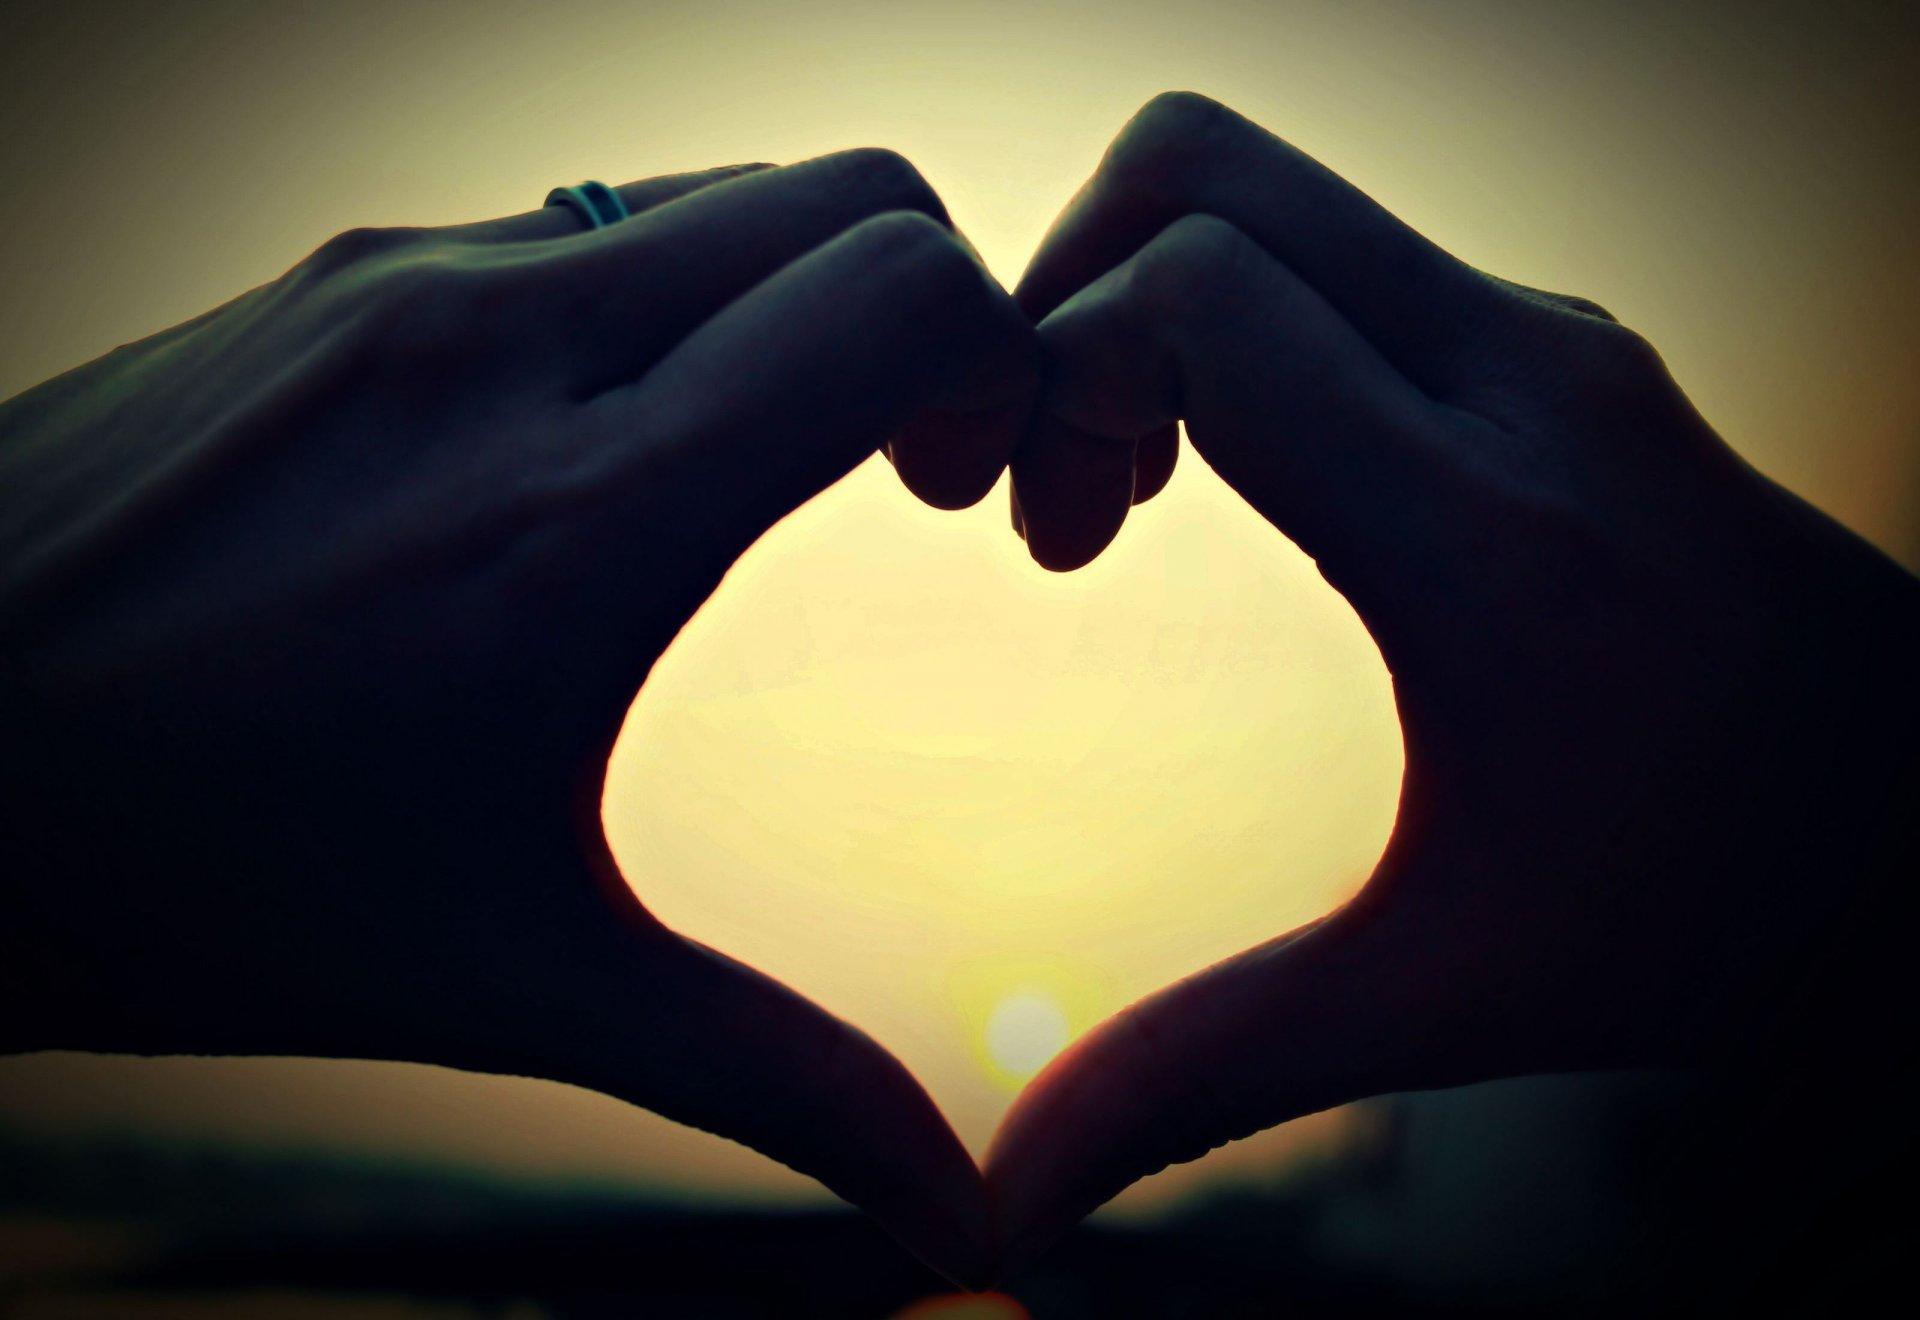 Картинки с сердцем и руками